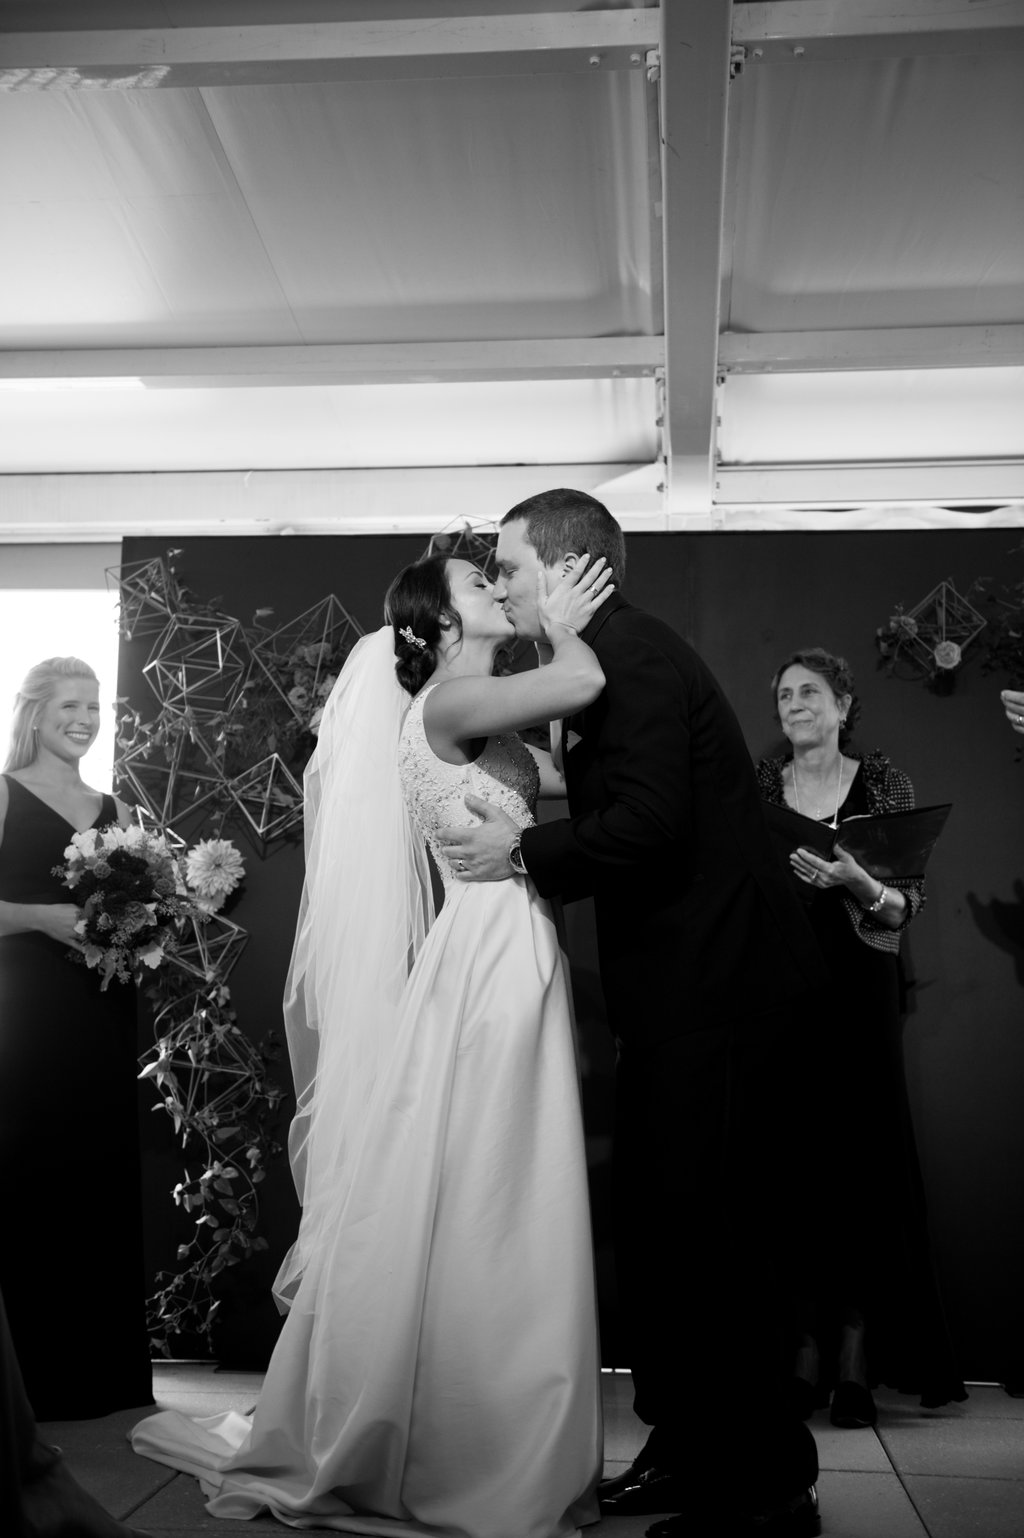 ceremony kiss - photo by Abby Jiu Photography http://ruffledblog.com/modern-metallics-wedding-in-downtown-washington-dc